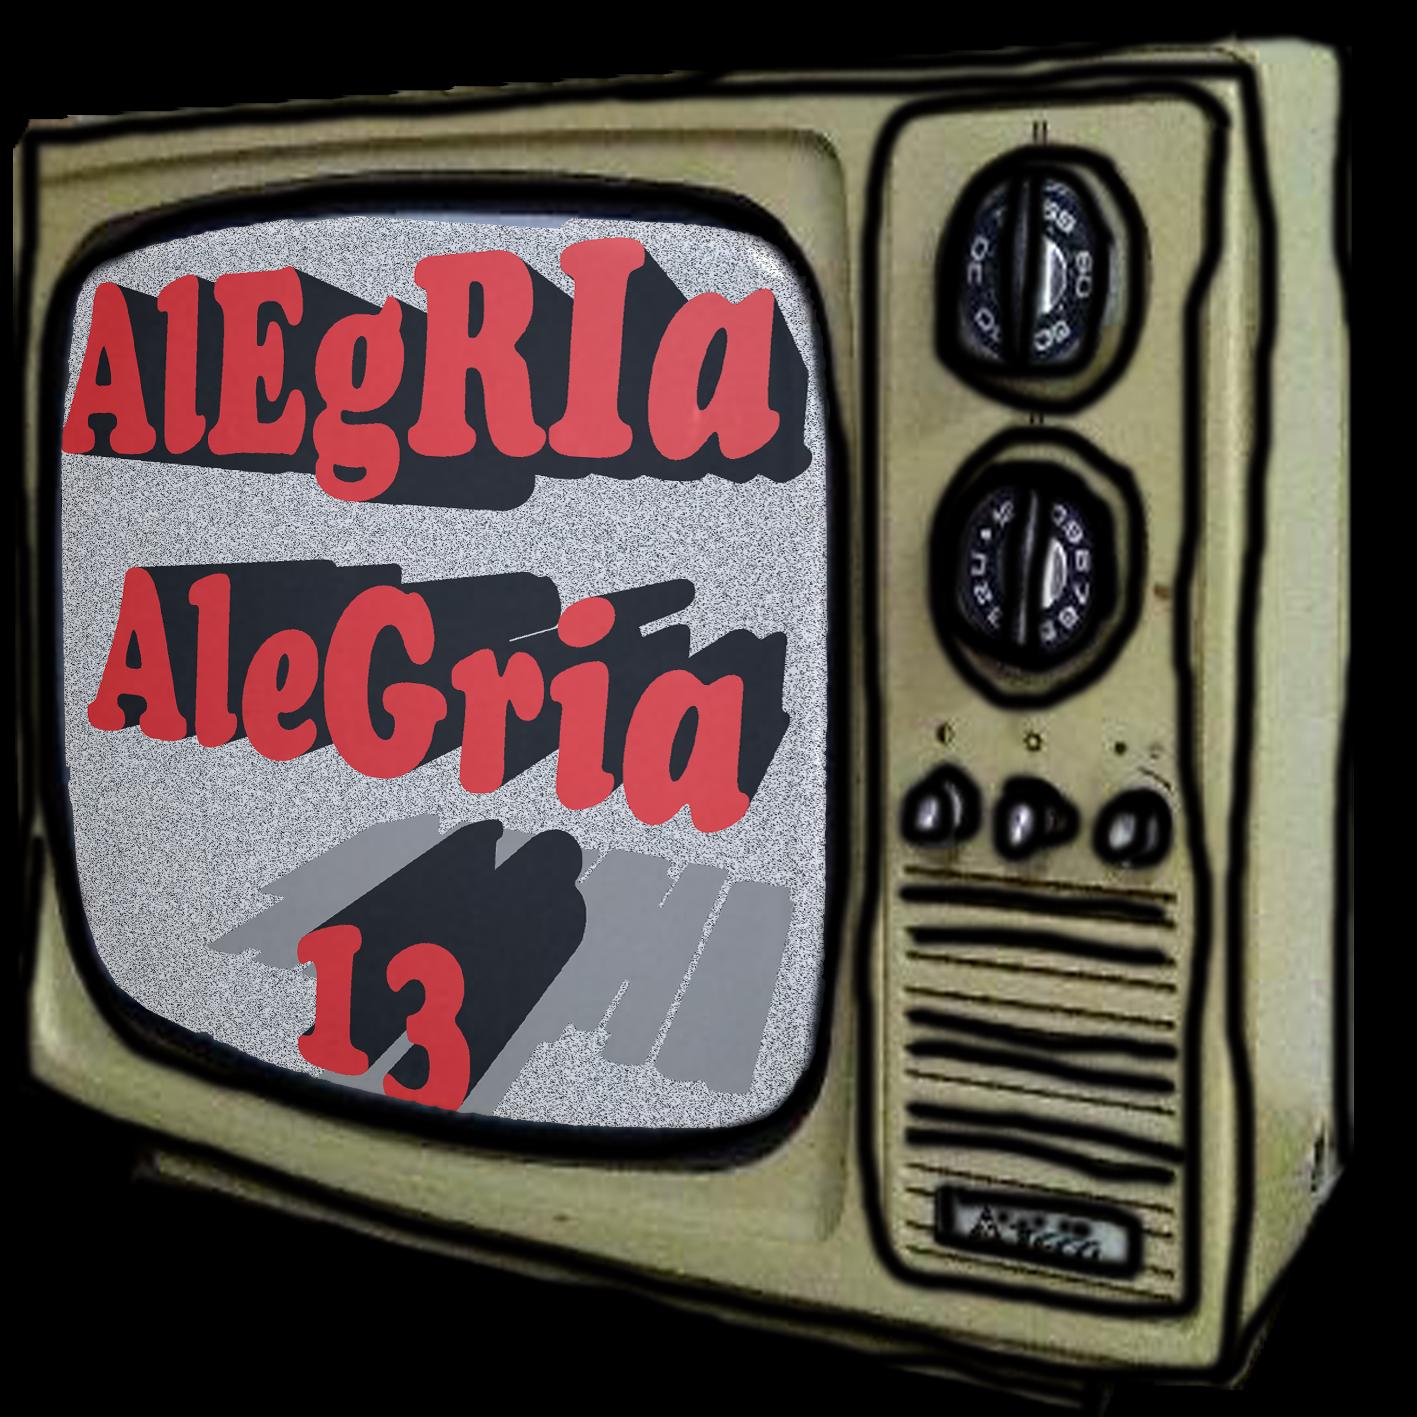 AlEgRIa AleGria 13